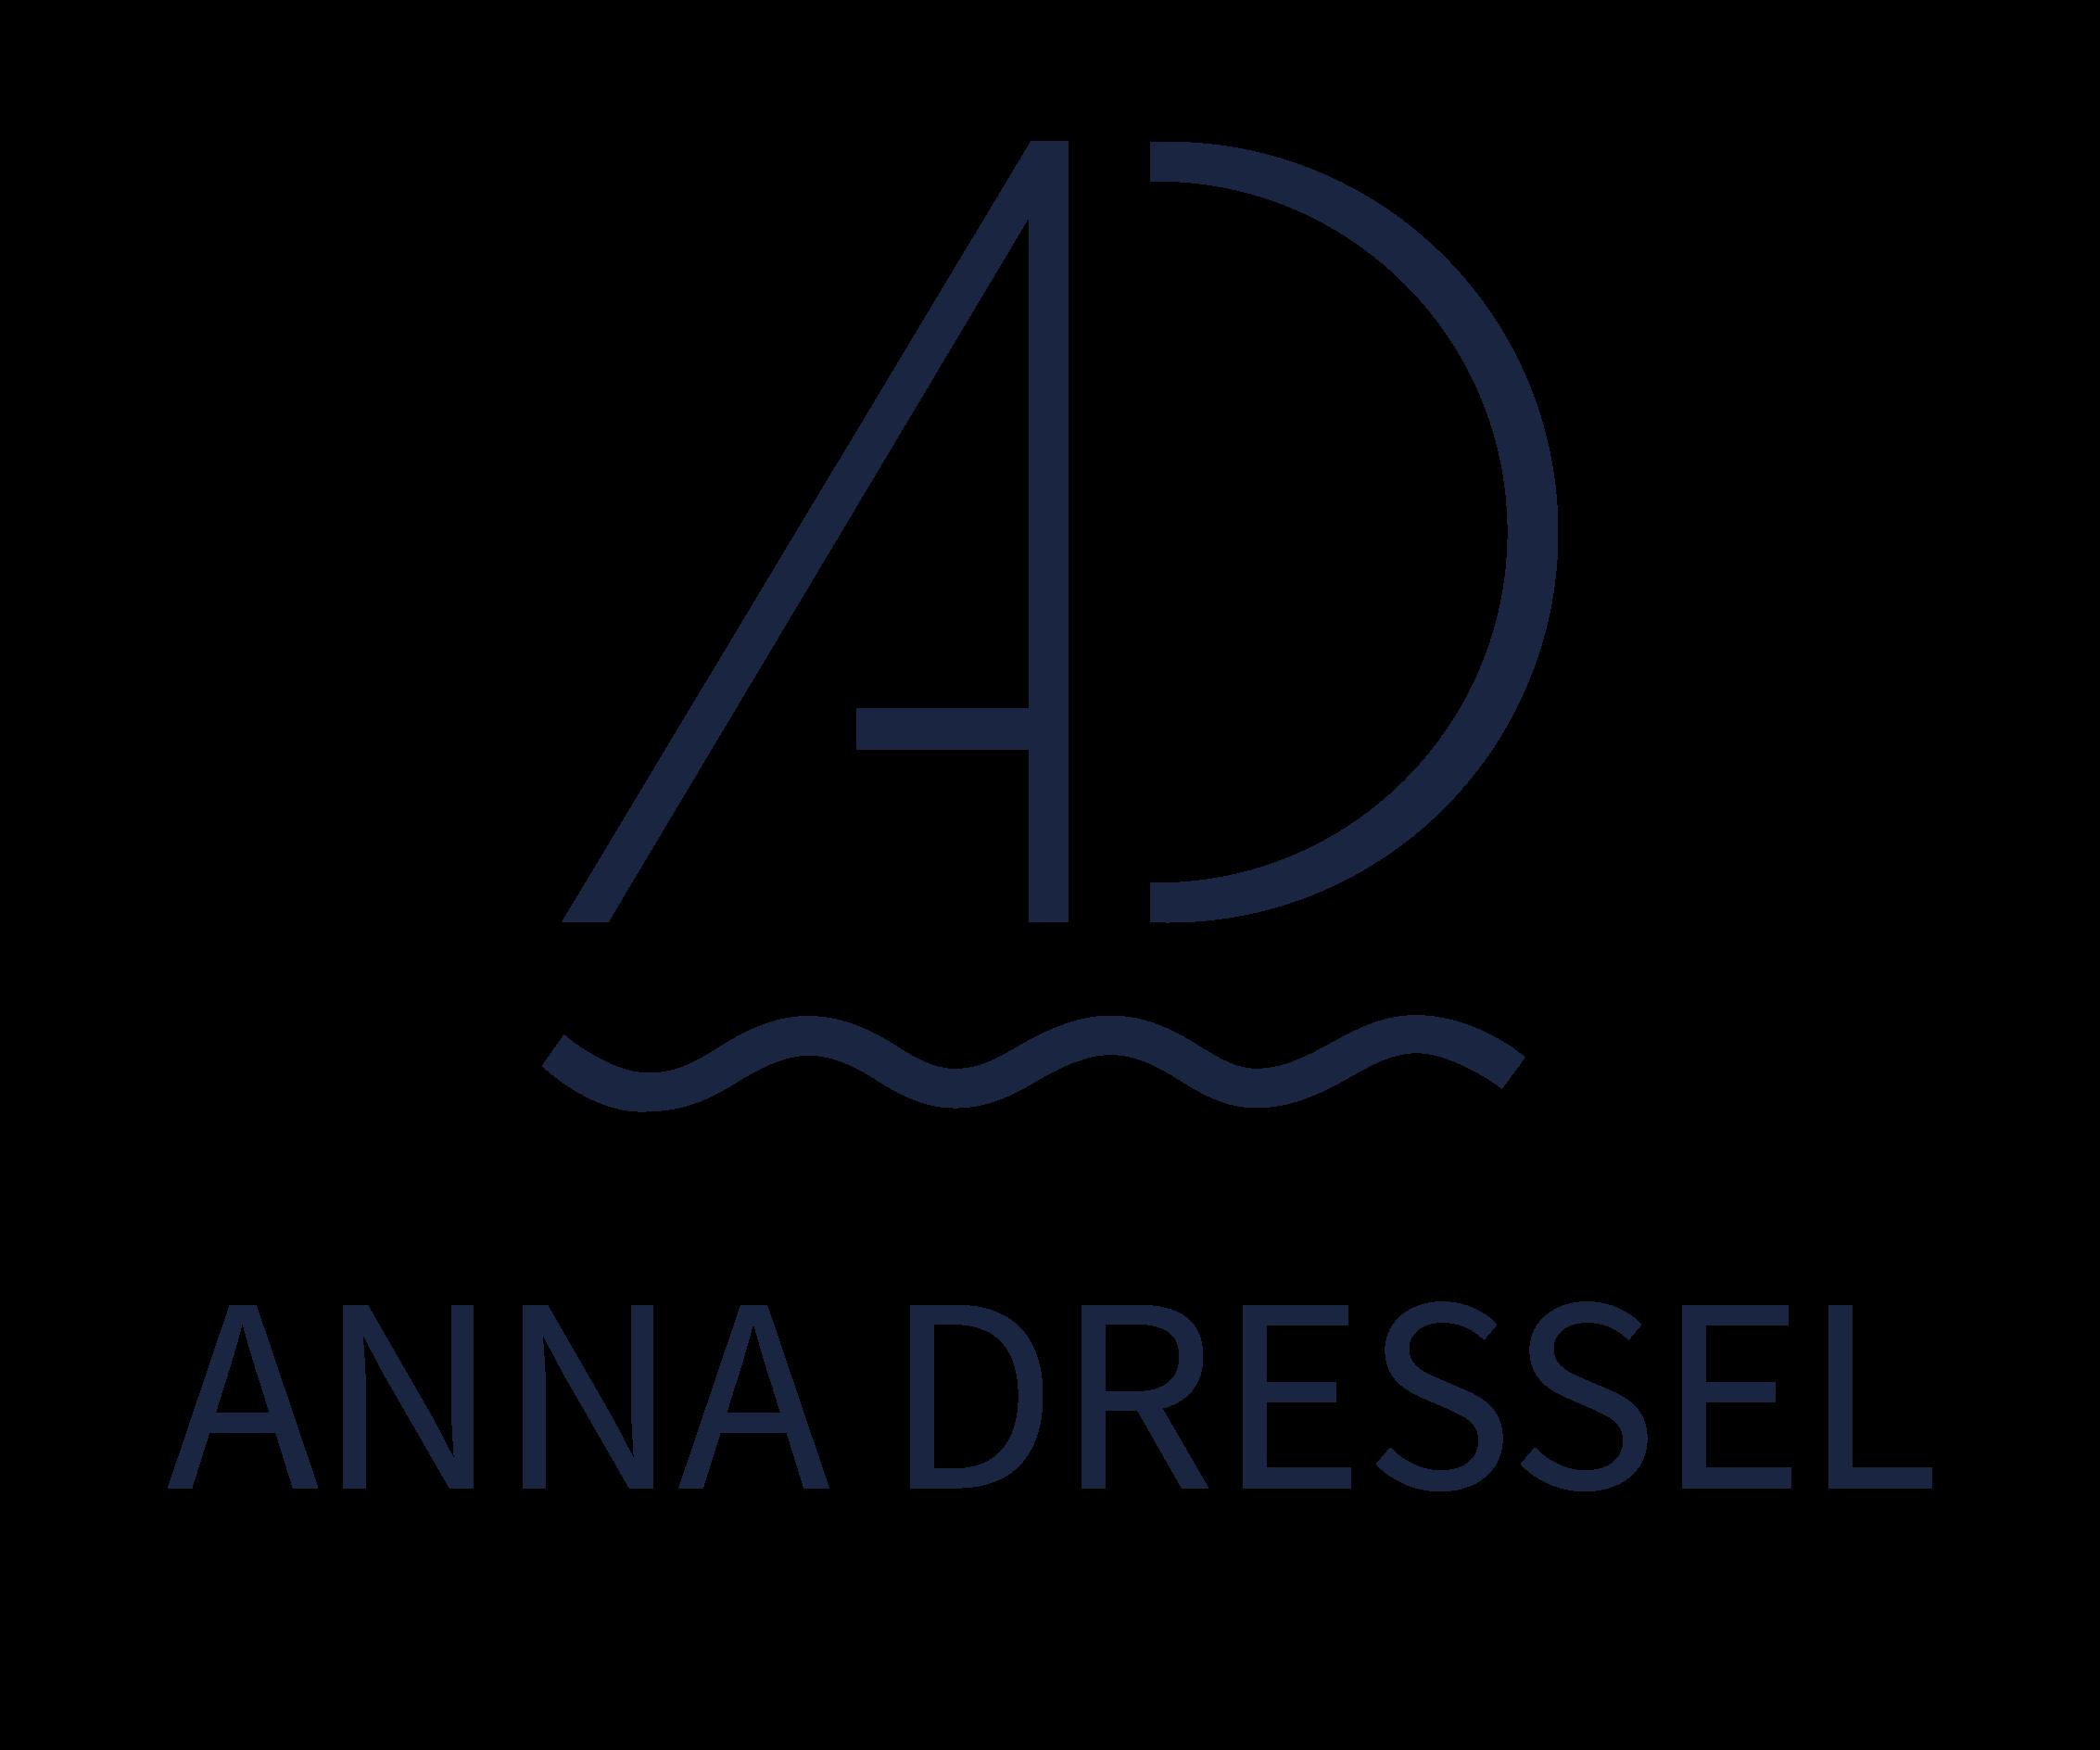 ANNA DRESSEL